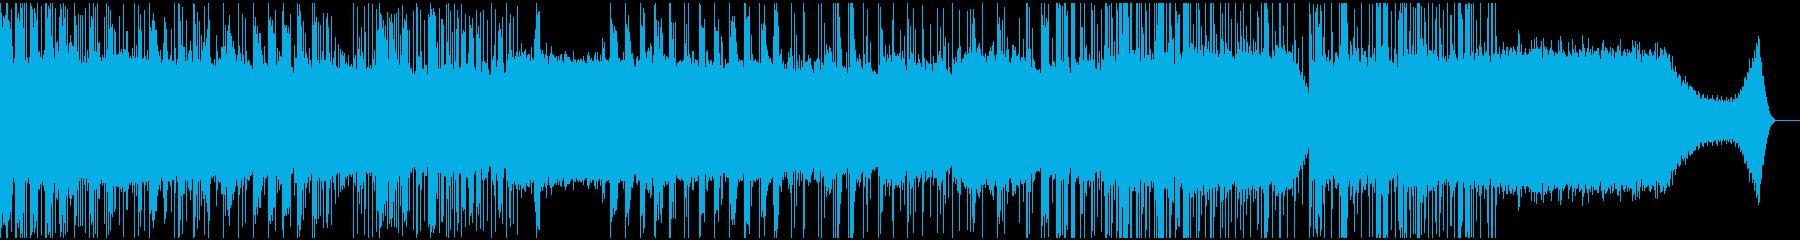 railway sequenceの再生済みの波形